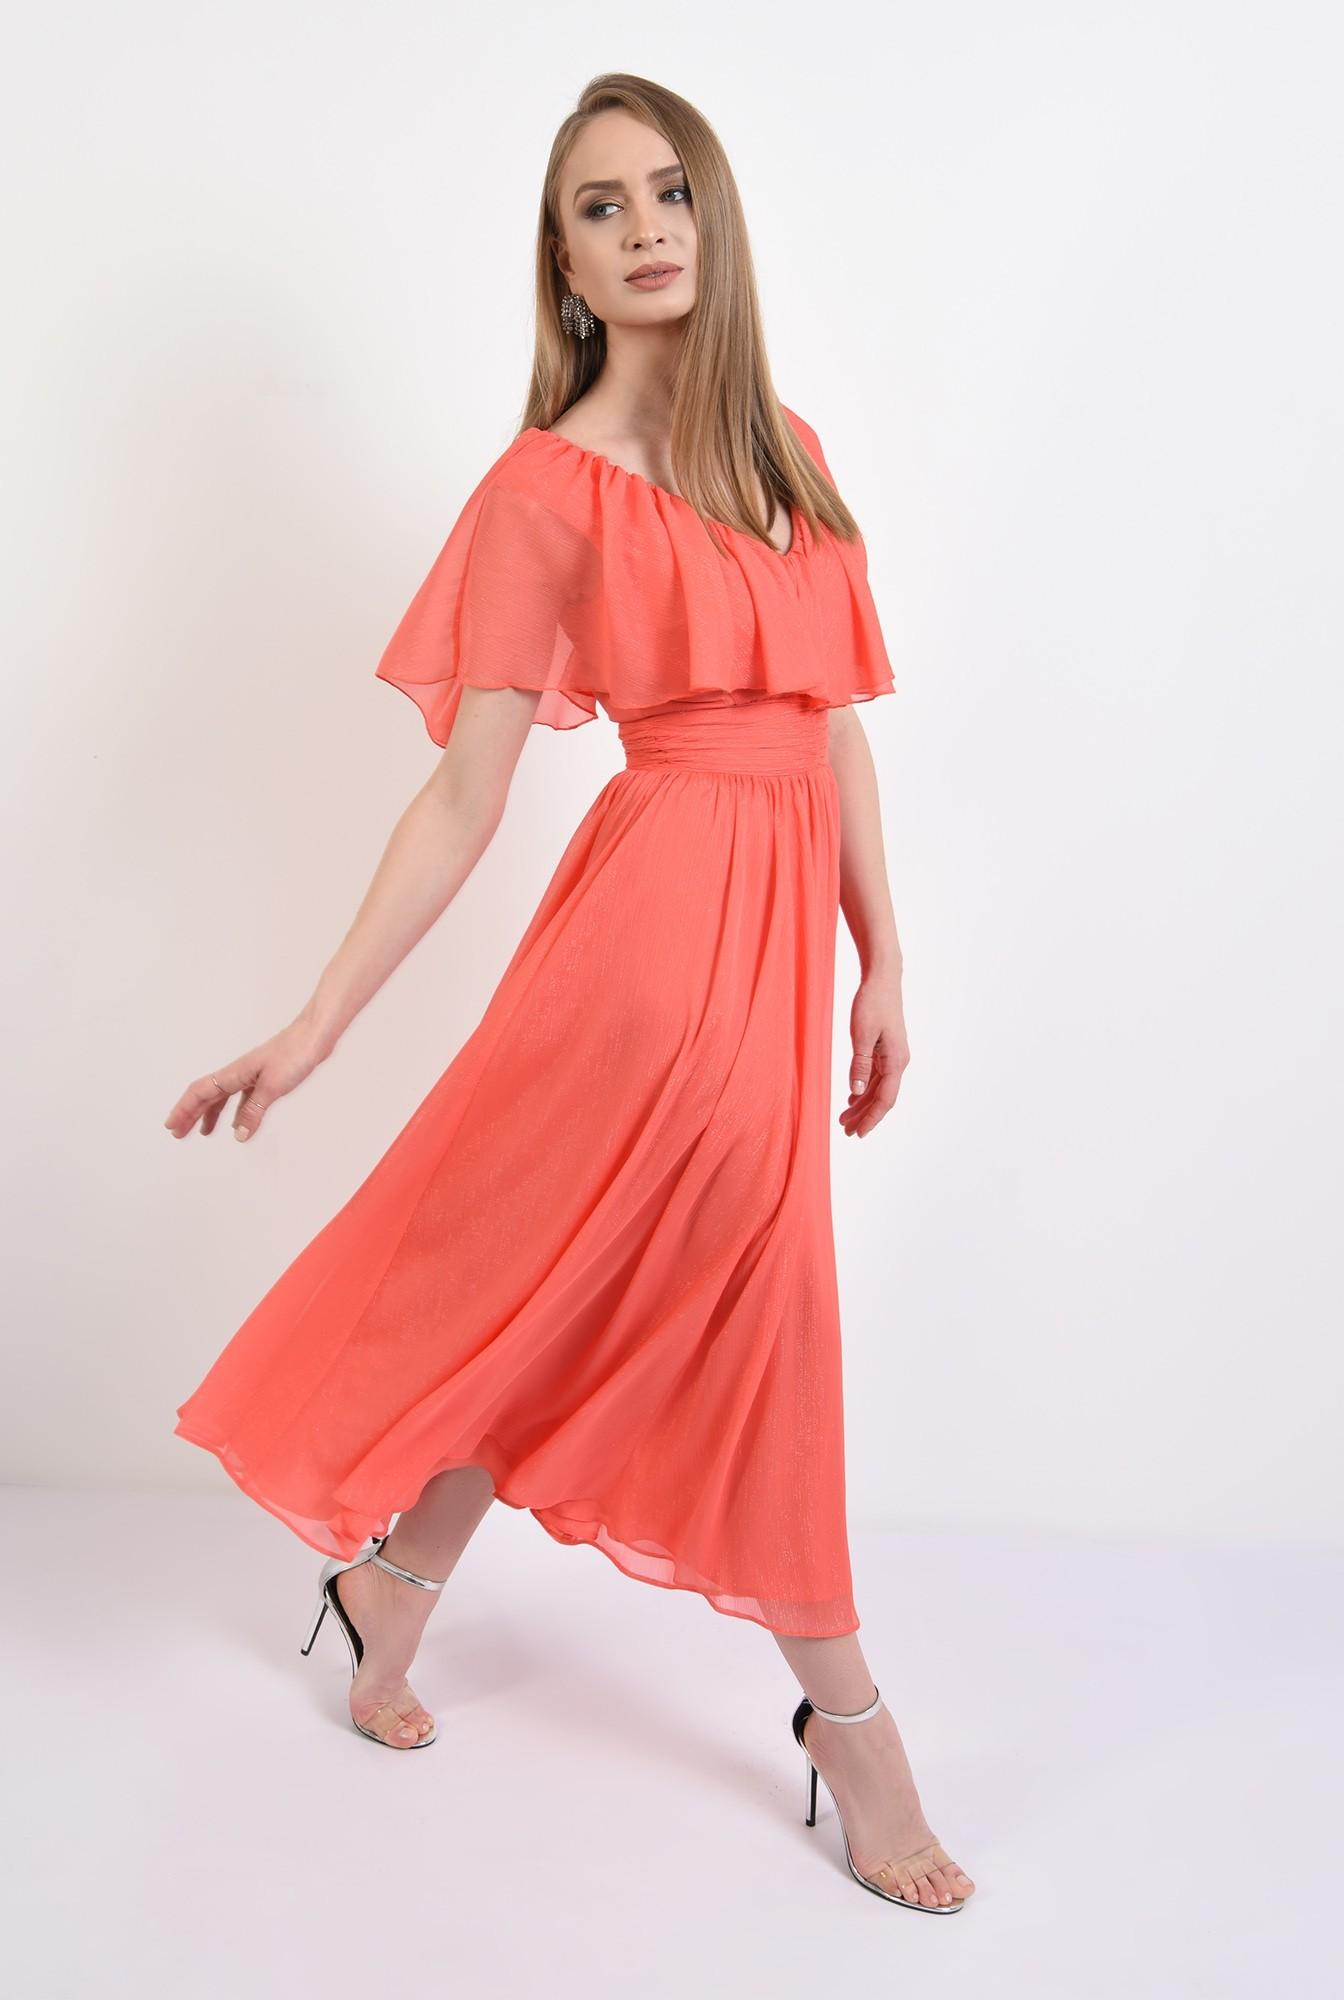 3 - rochie eleganta, midi, volan, brau fronsat, evazata, rochie de seara